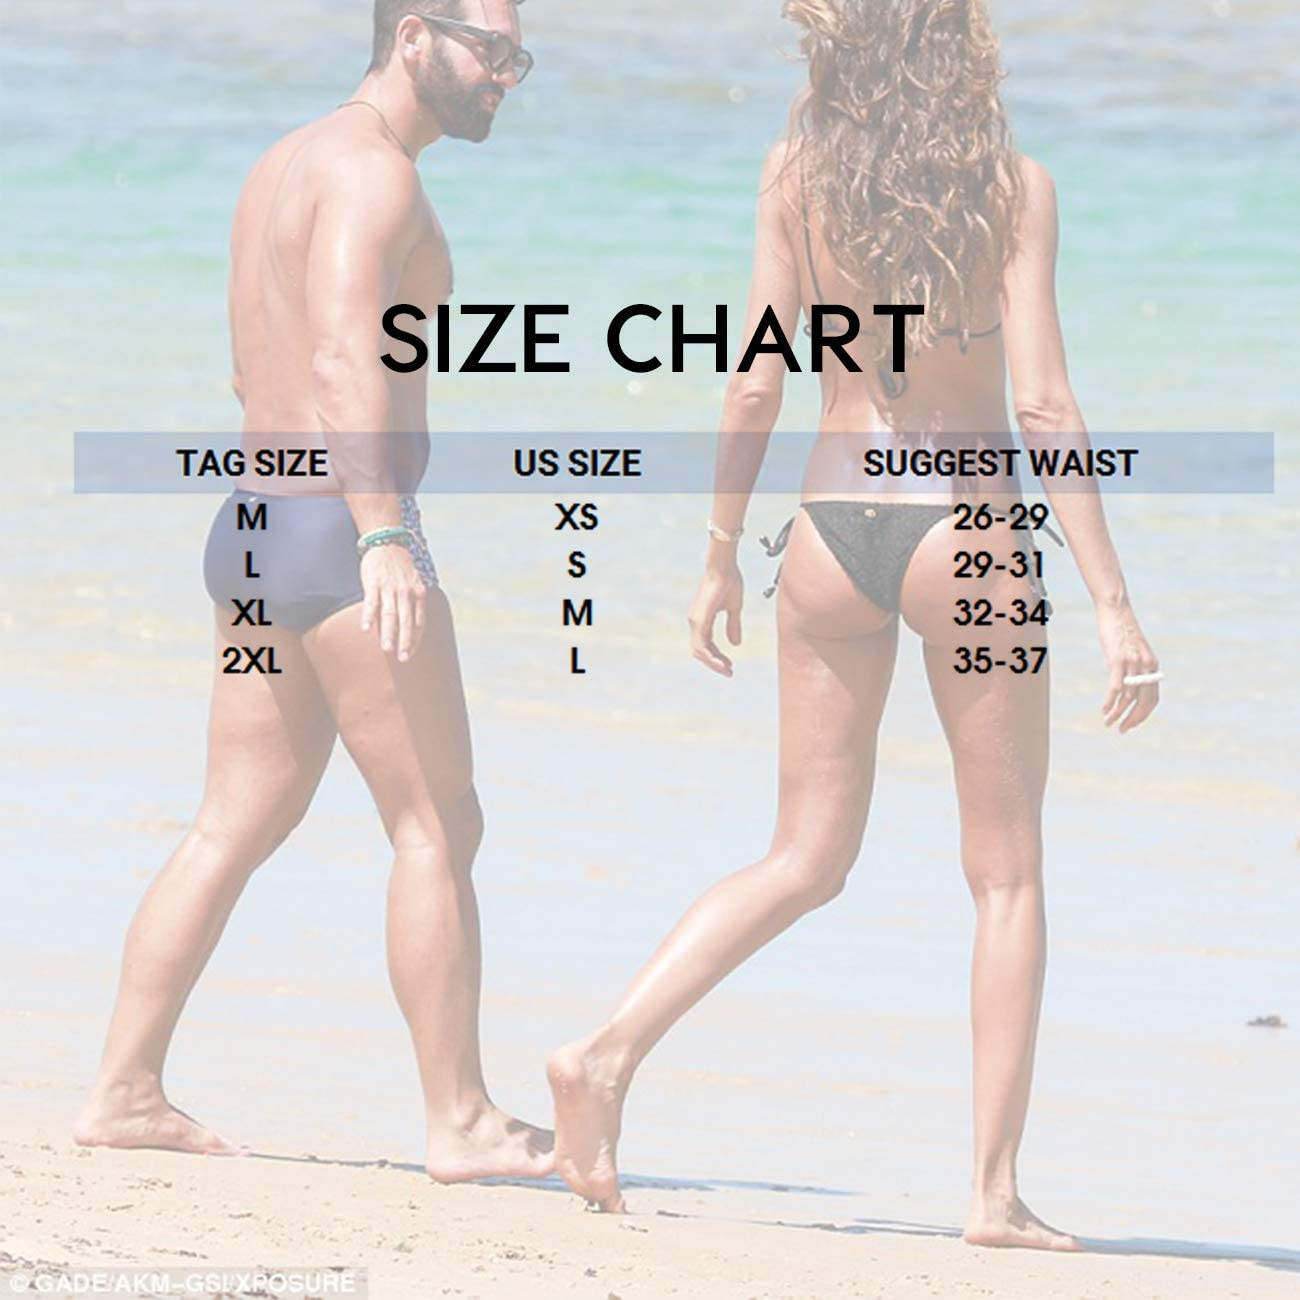 MIZOK Mens Quick Dry Swim Briefs Bikini Swimsuit Board Shorts with Adjustable Drawstrig